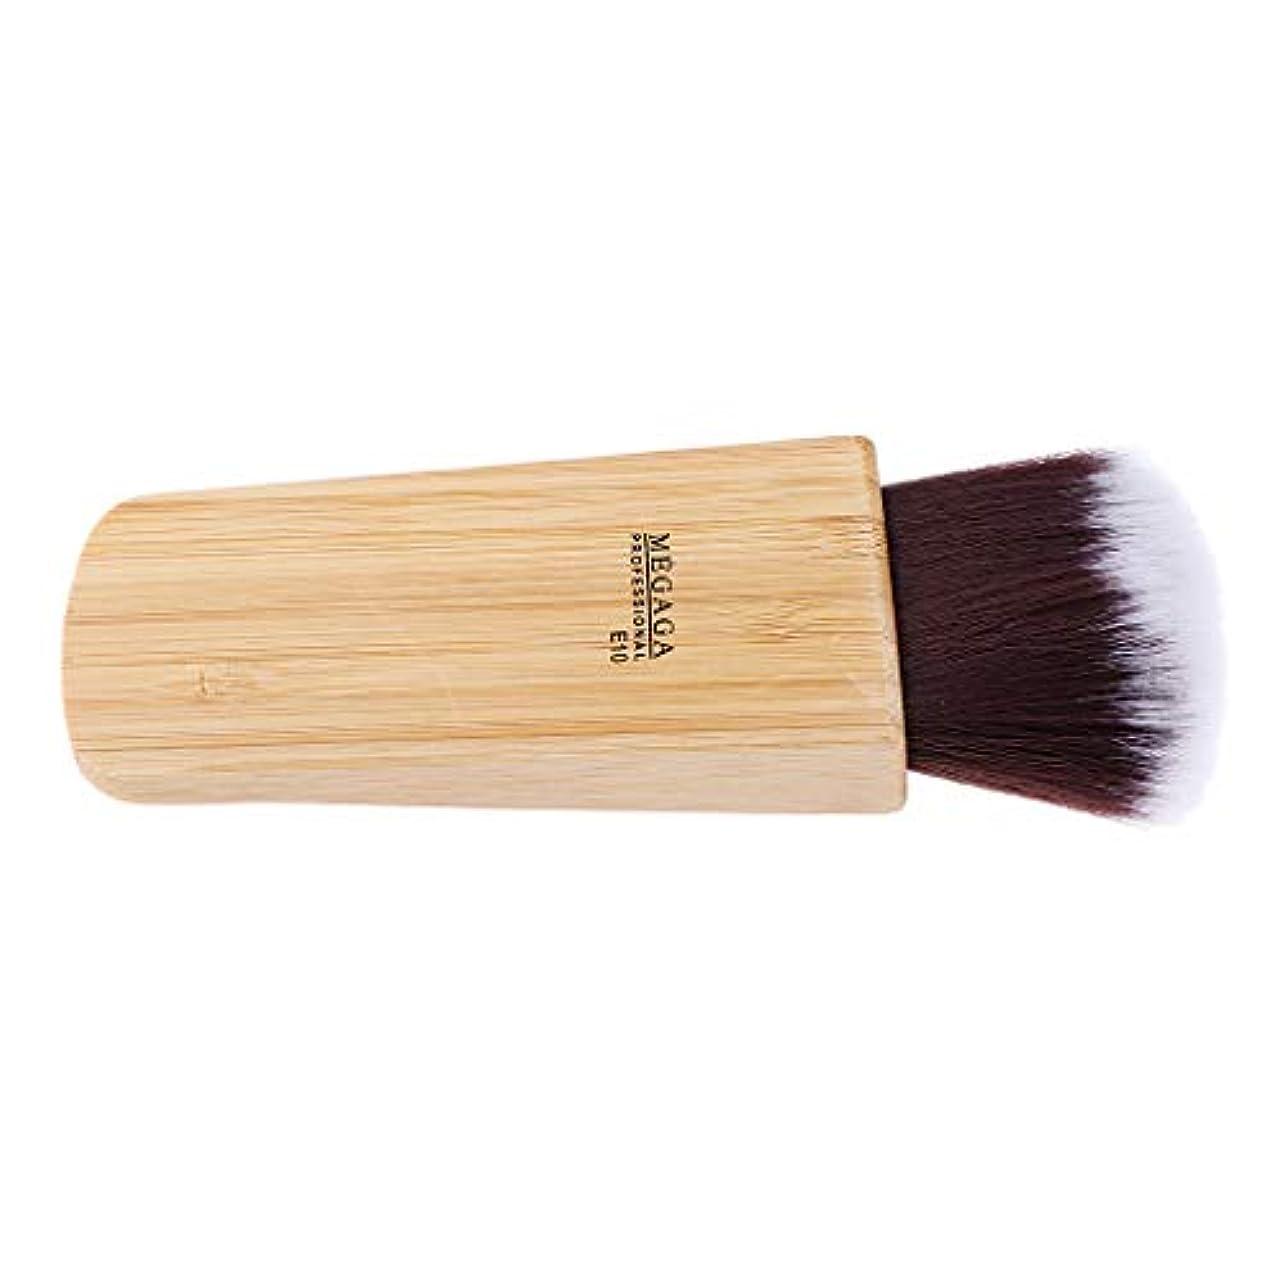 CUTICATE ネックダスターブラシ ヘアカット ブラシ ネックダスター 洗浄 ヘアブラシ 理髪美容ツール